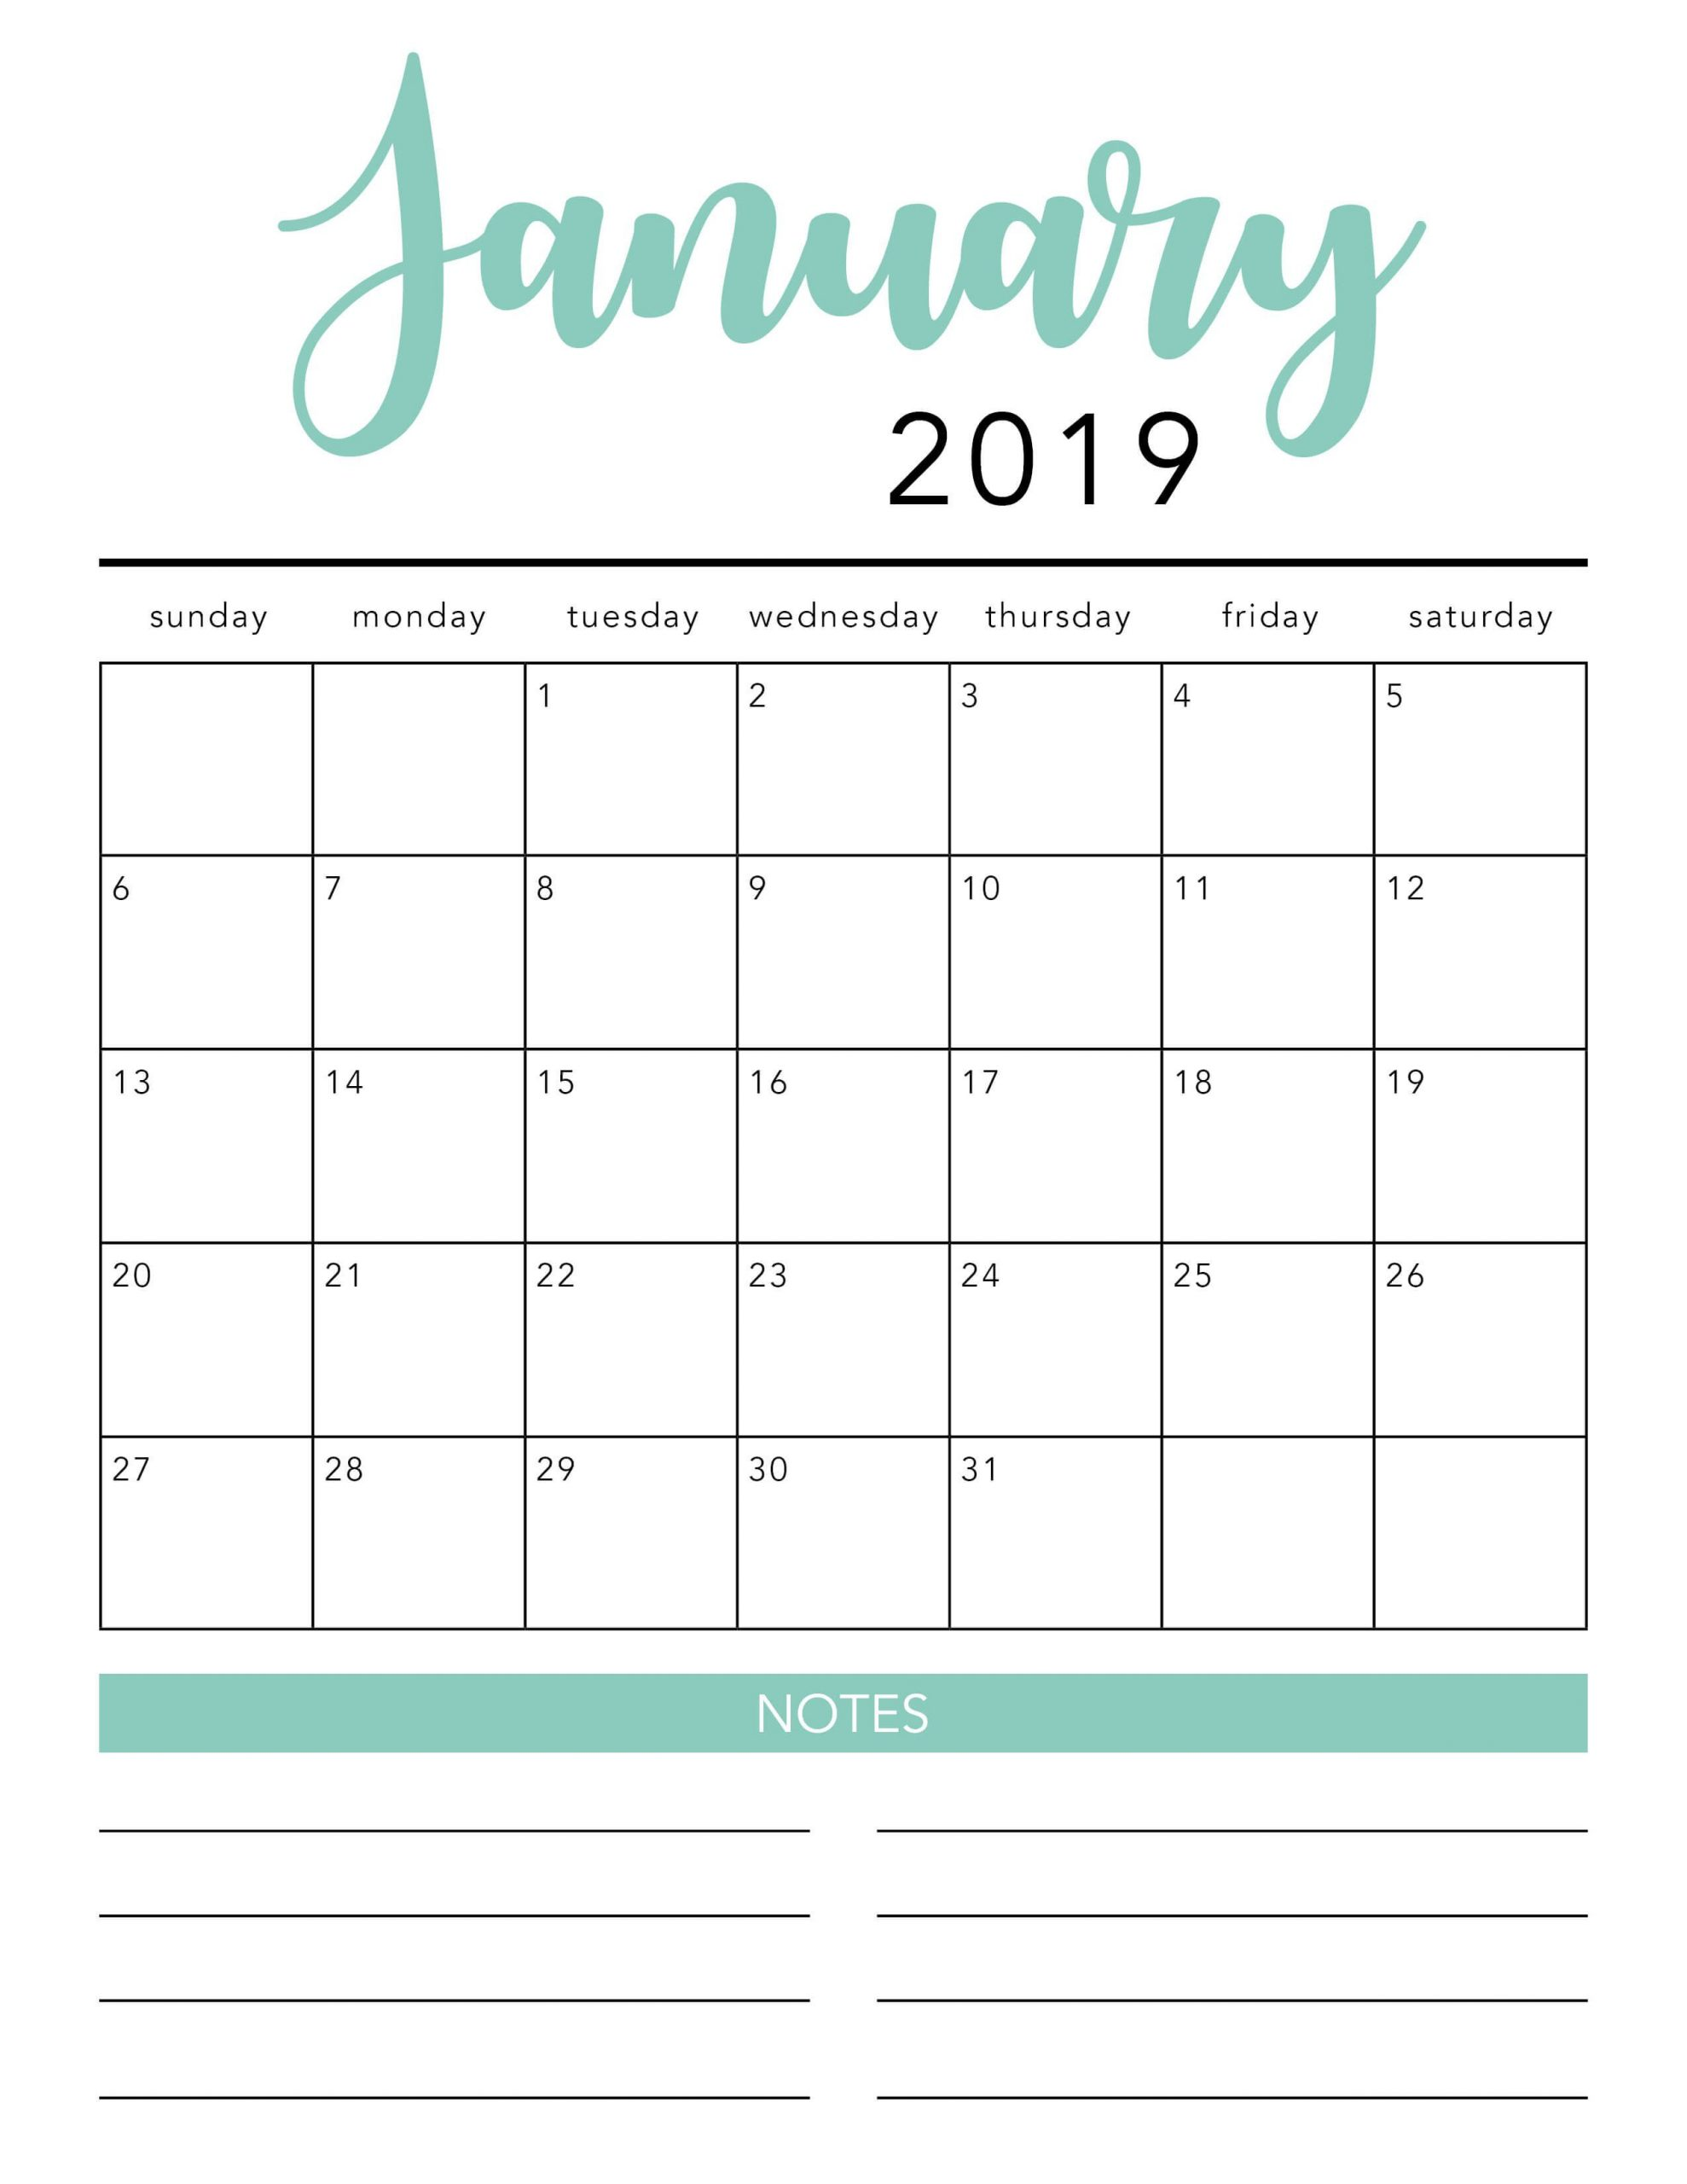 Free Printable Calendar Templates - Togo.wpart.co